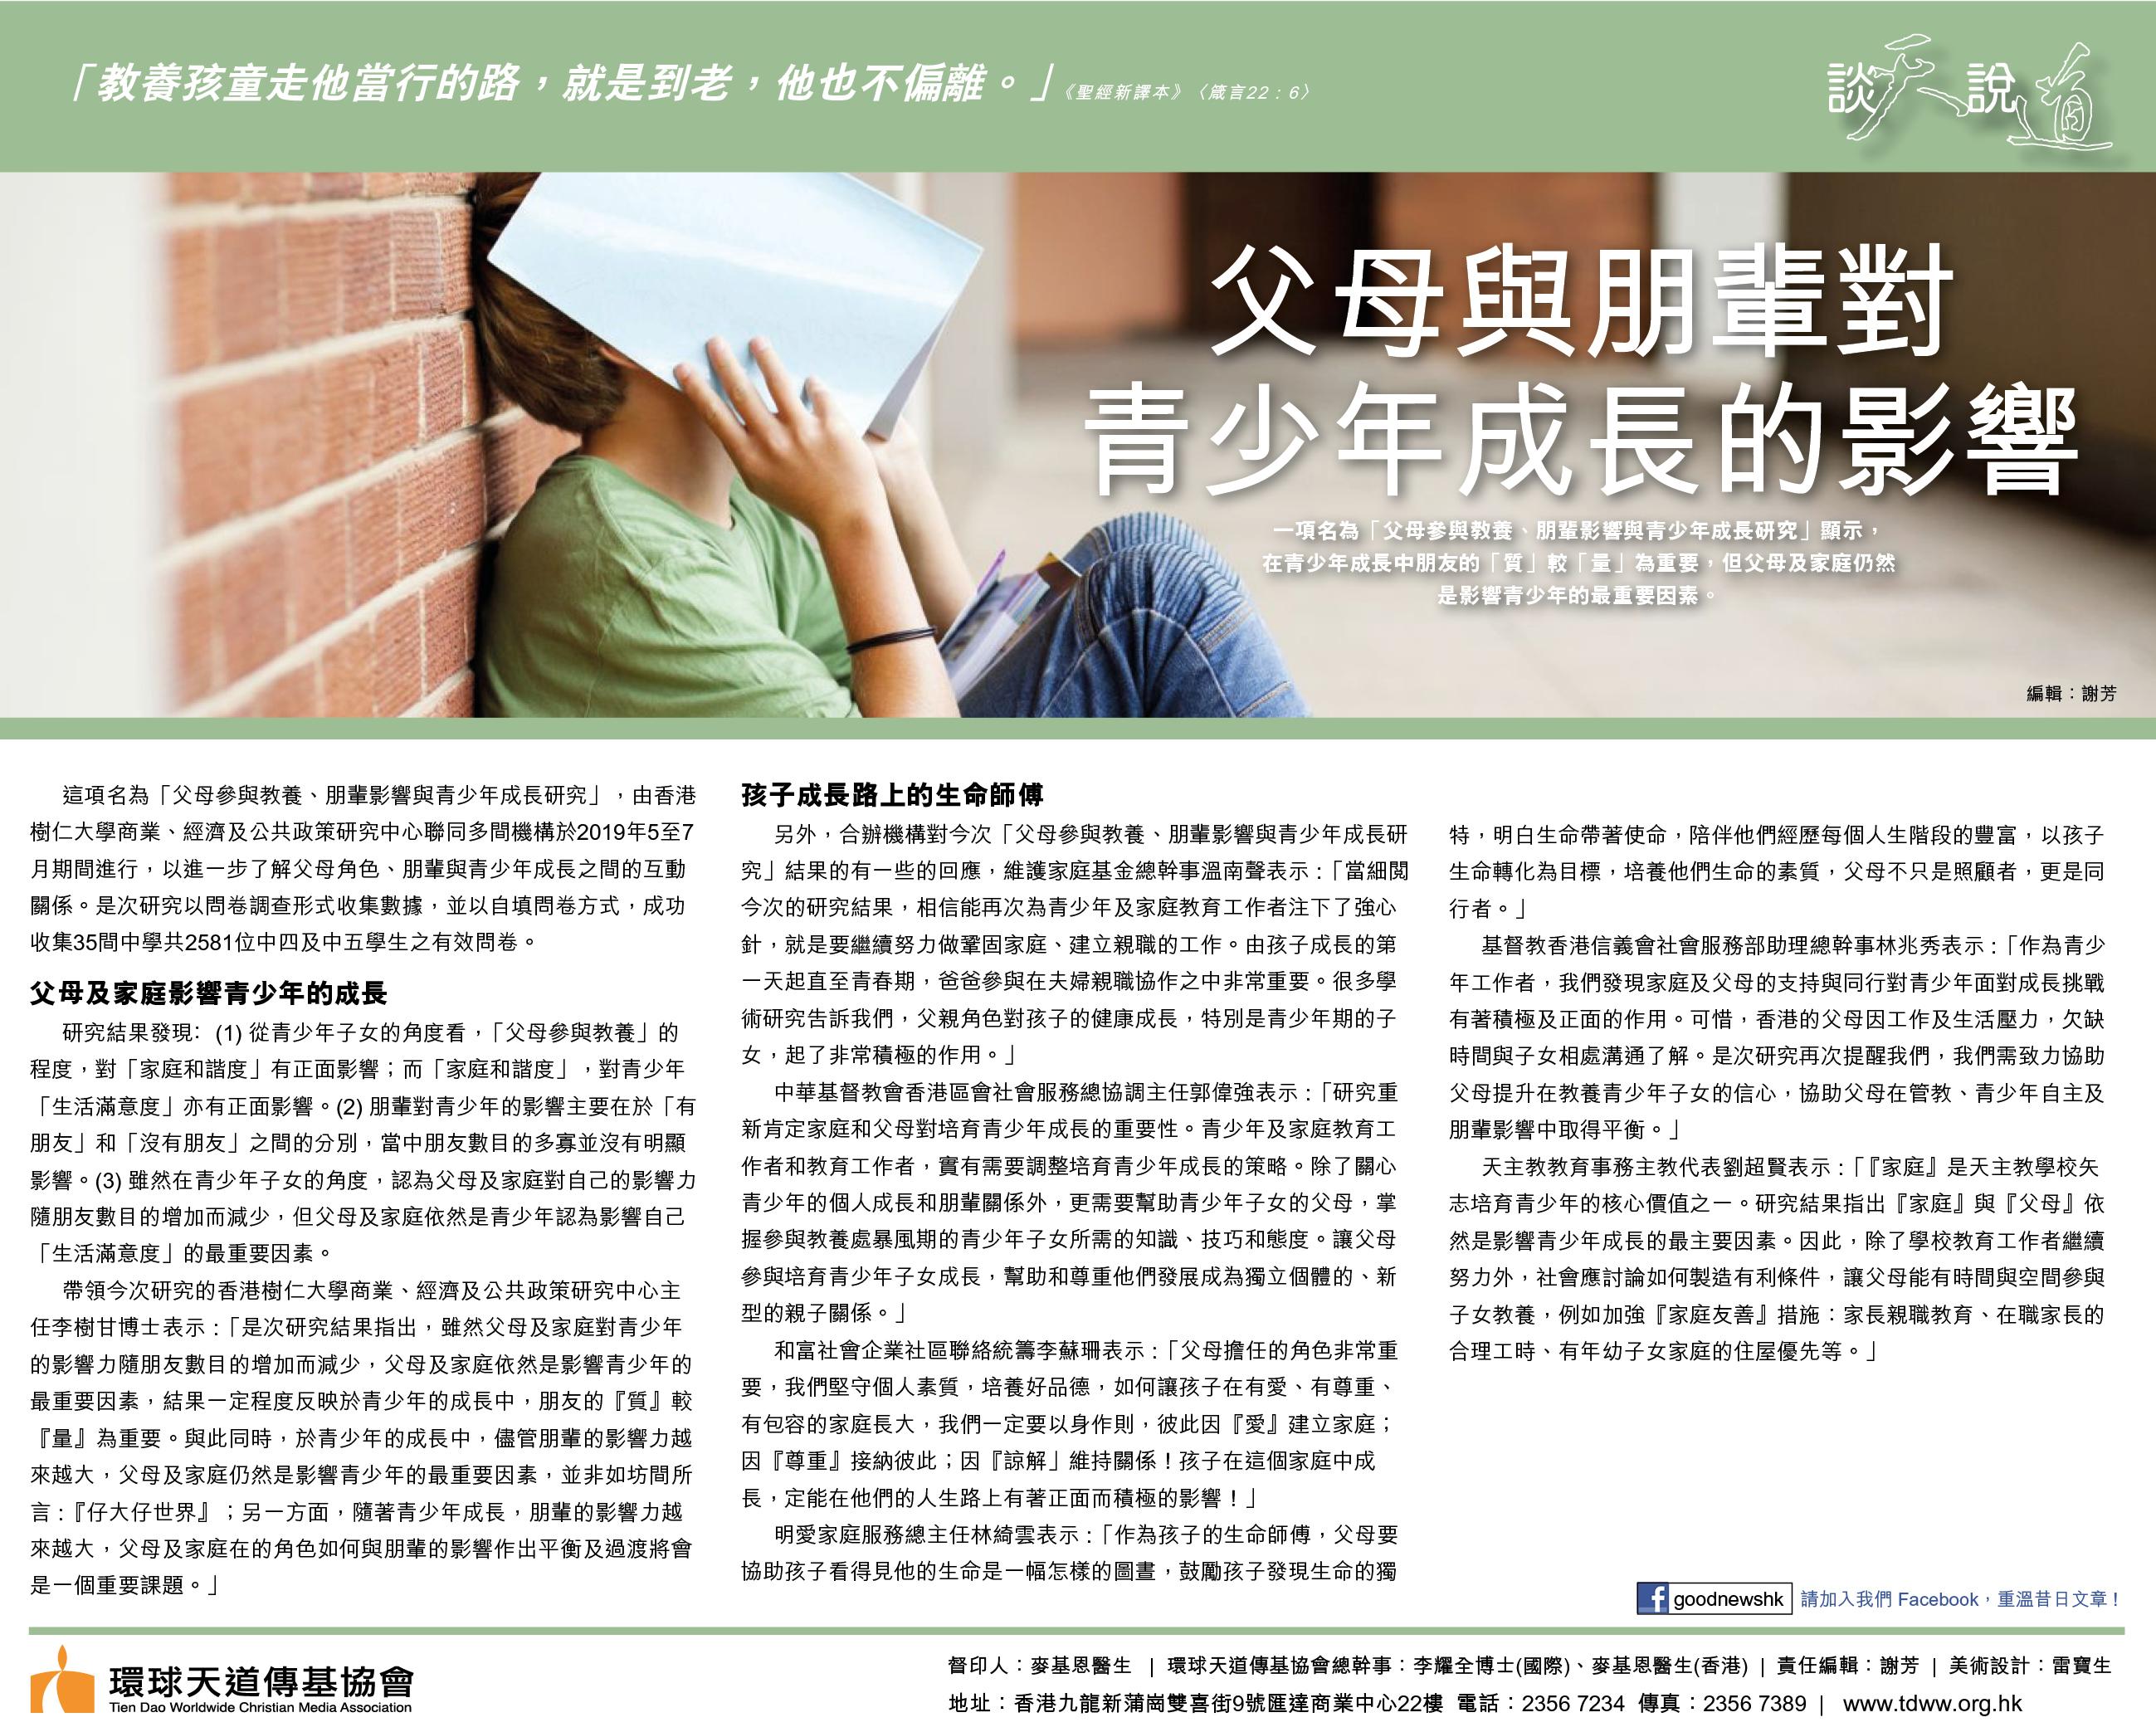 2020_Jan_20父母與朋輩對青少年成長的影響